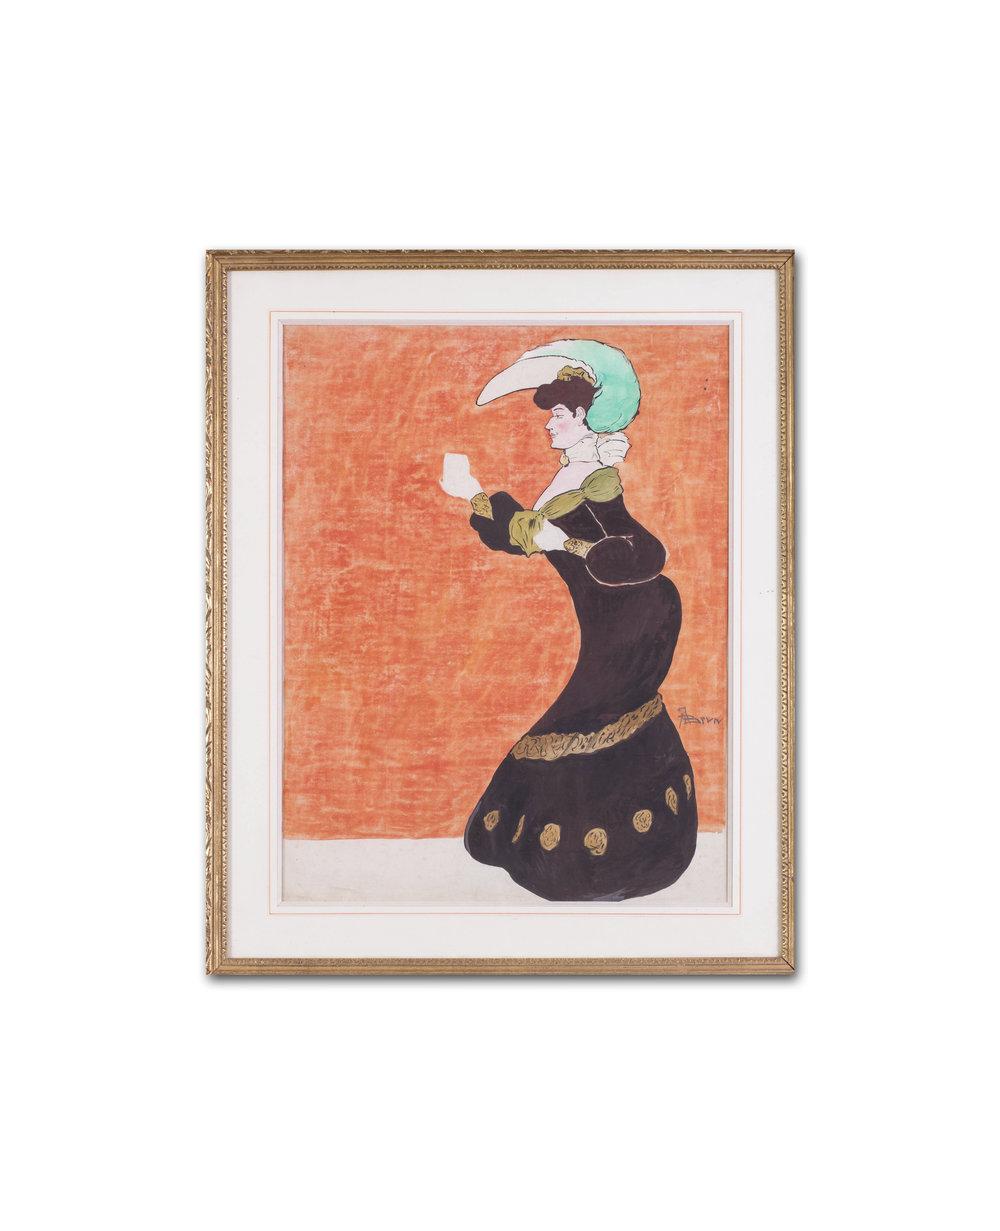 A Brun      Raising a glass     Pencil, watercolour and gouache on canvas    20.1/2 x 15.3/4in. (52 x 40 cm.)     Price: £1,050